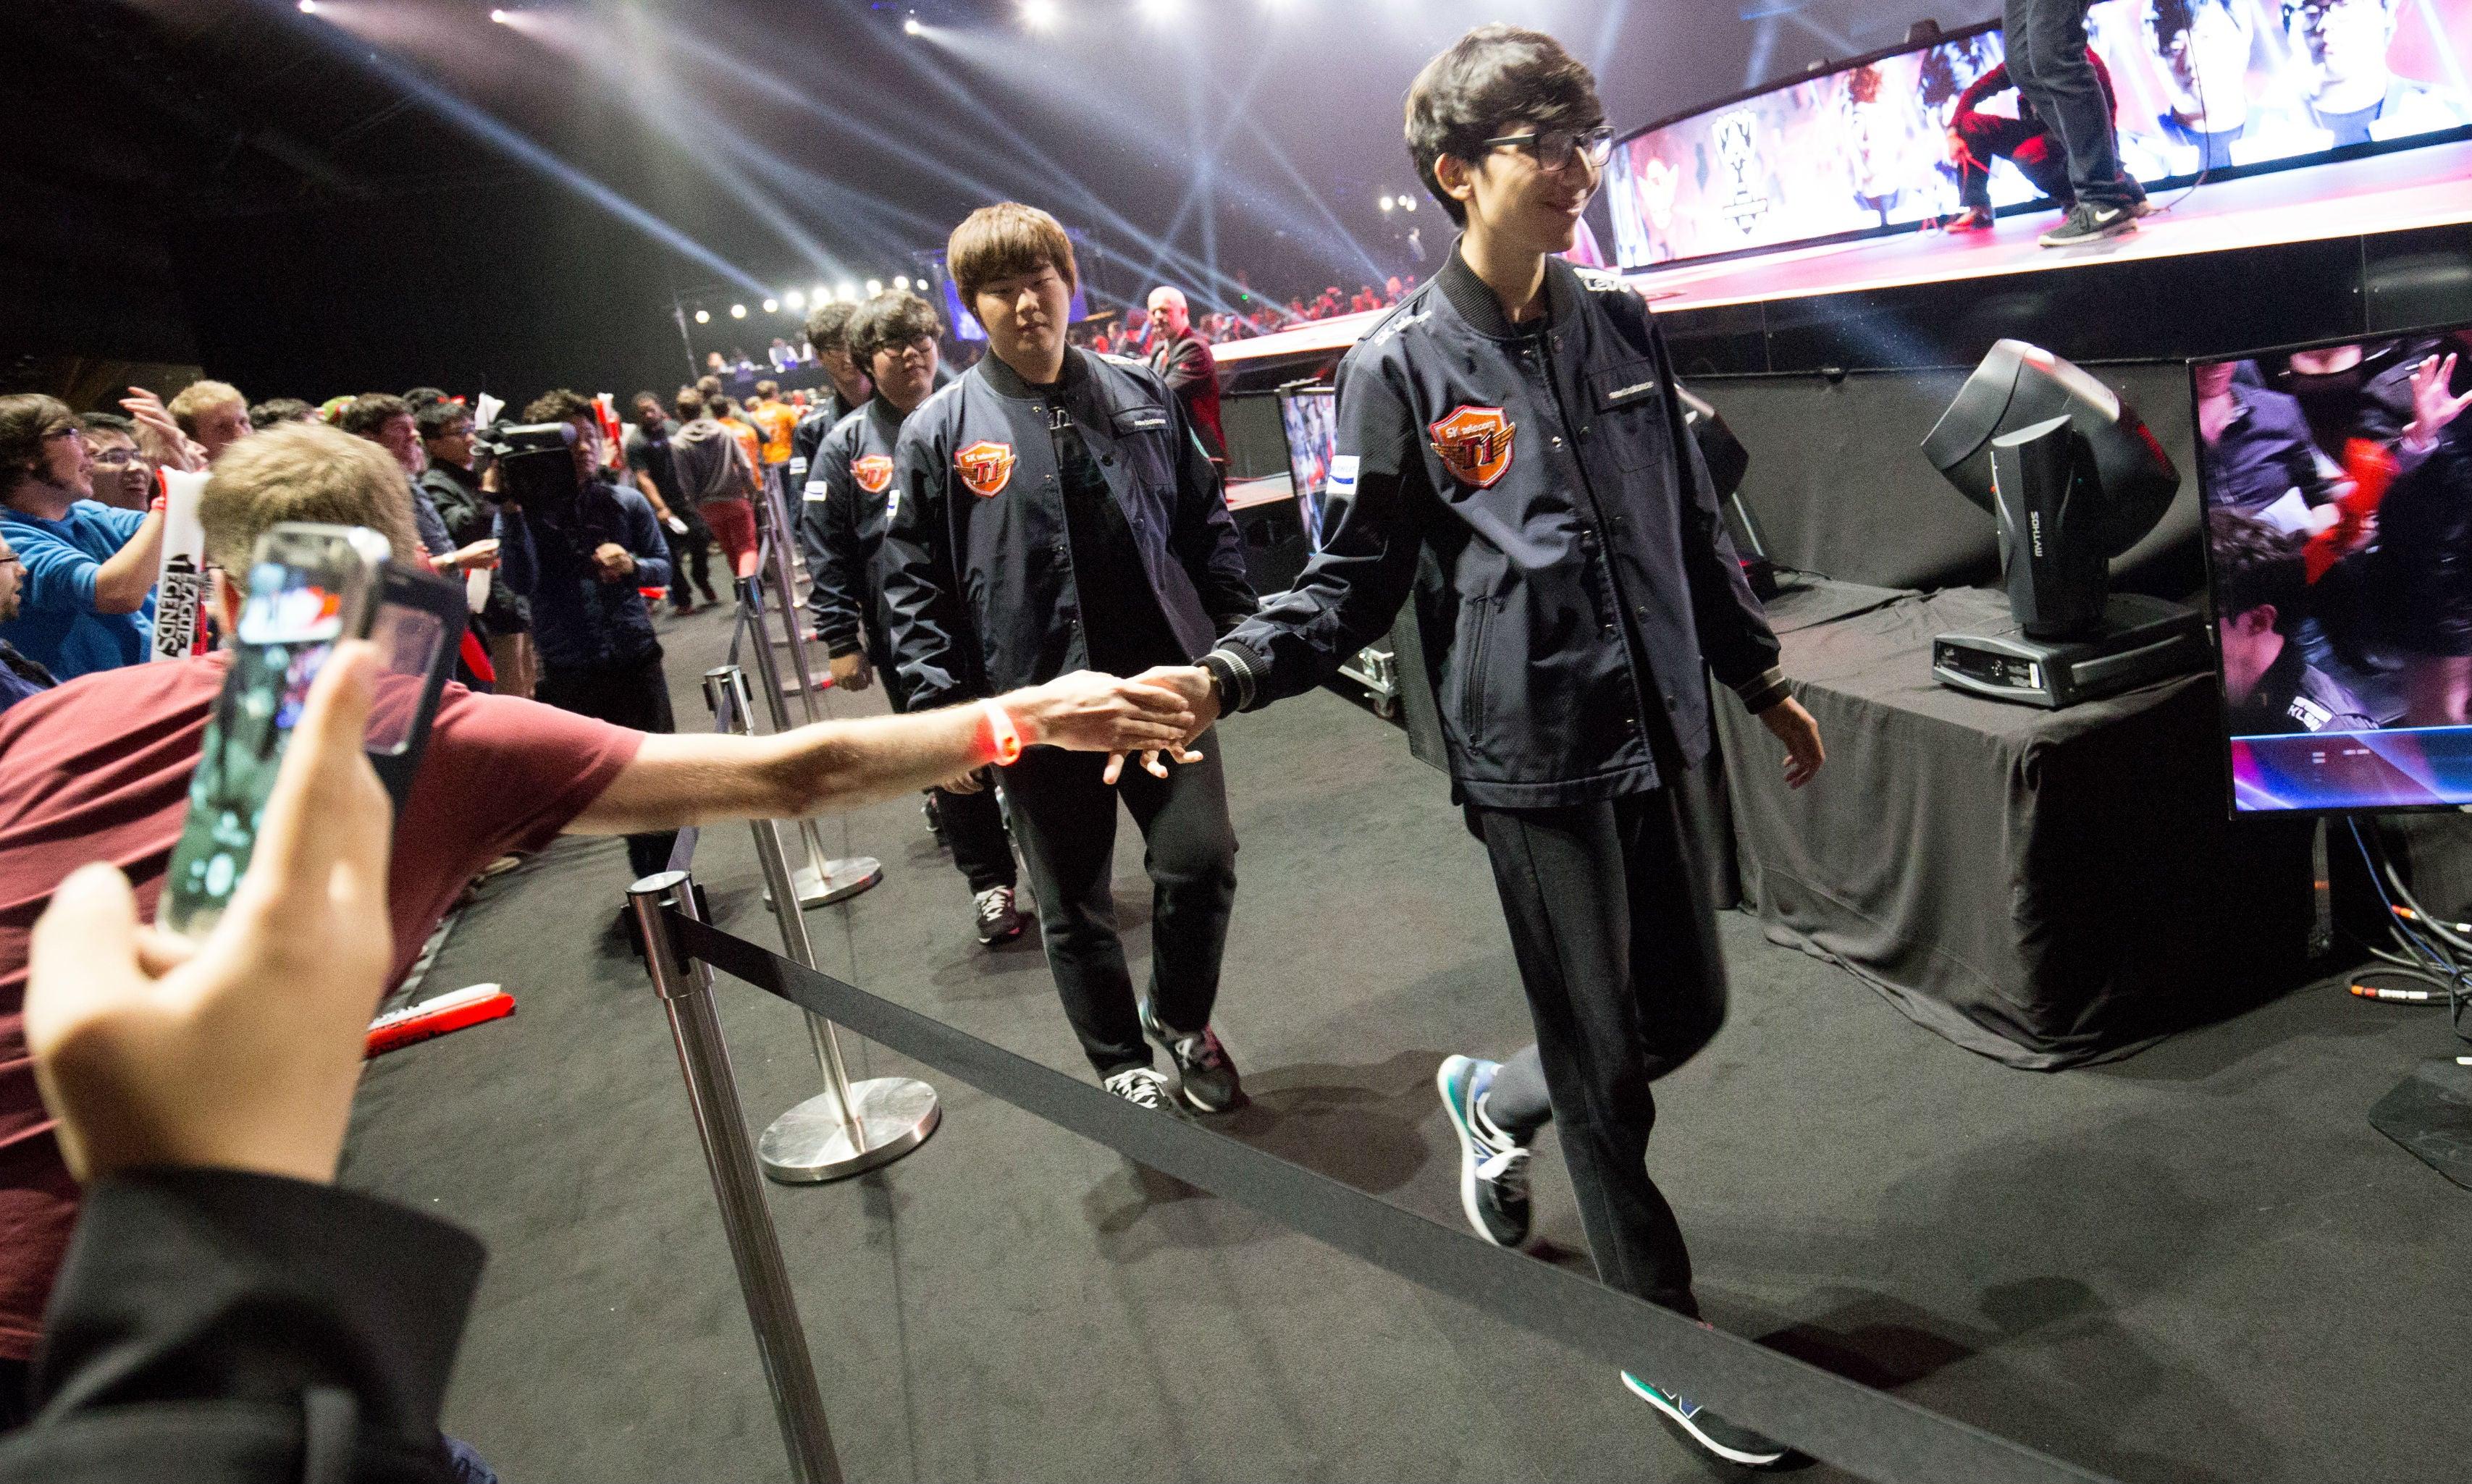 Top Korean League Of Legends Team SKT Still Hasn't Lost A Single Game At Worlds